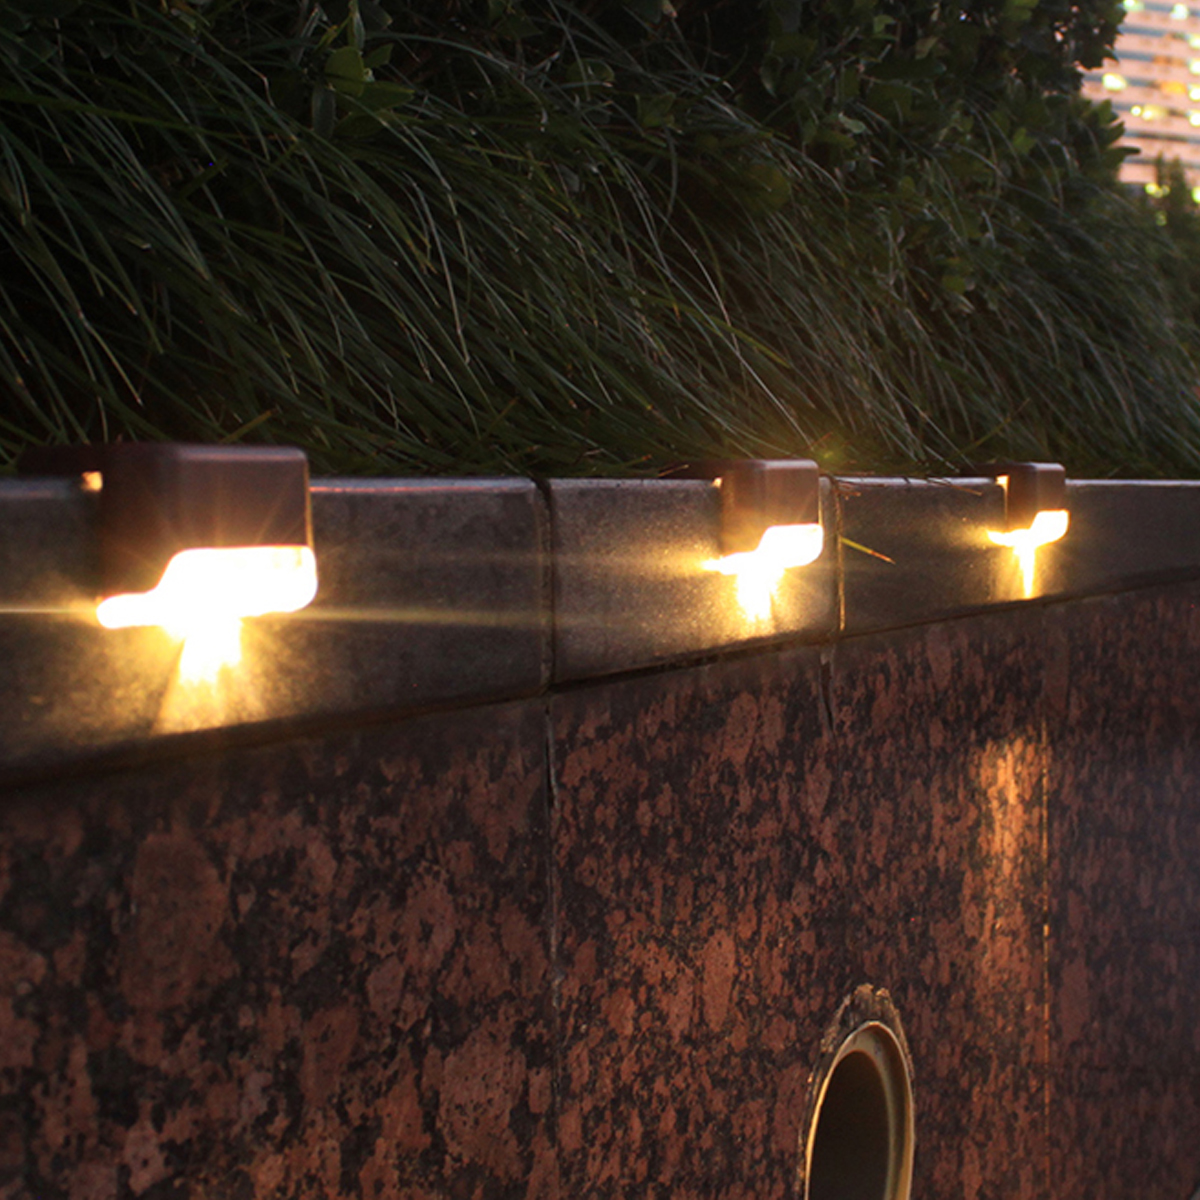 Solar LED Bright Deck Lights Outdoor Garden Patio Railing Decks Path Lighting